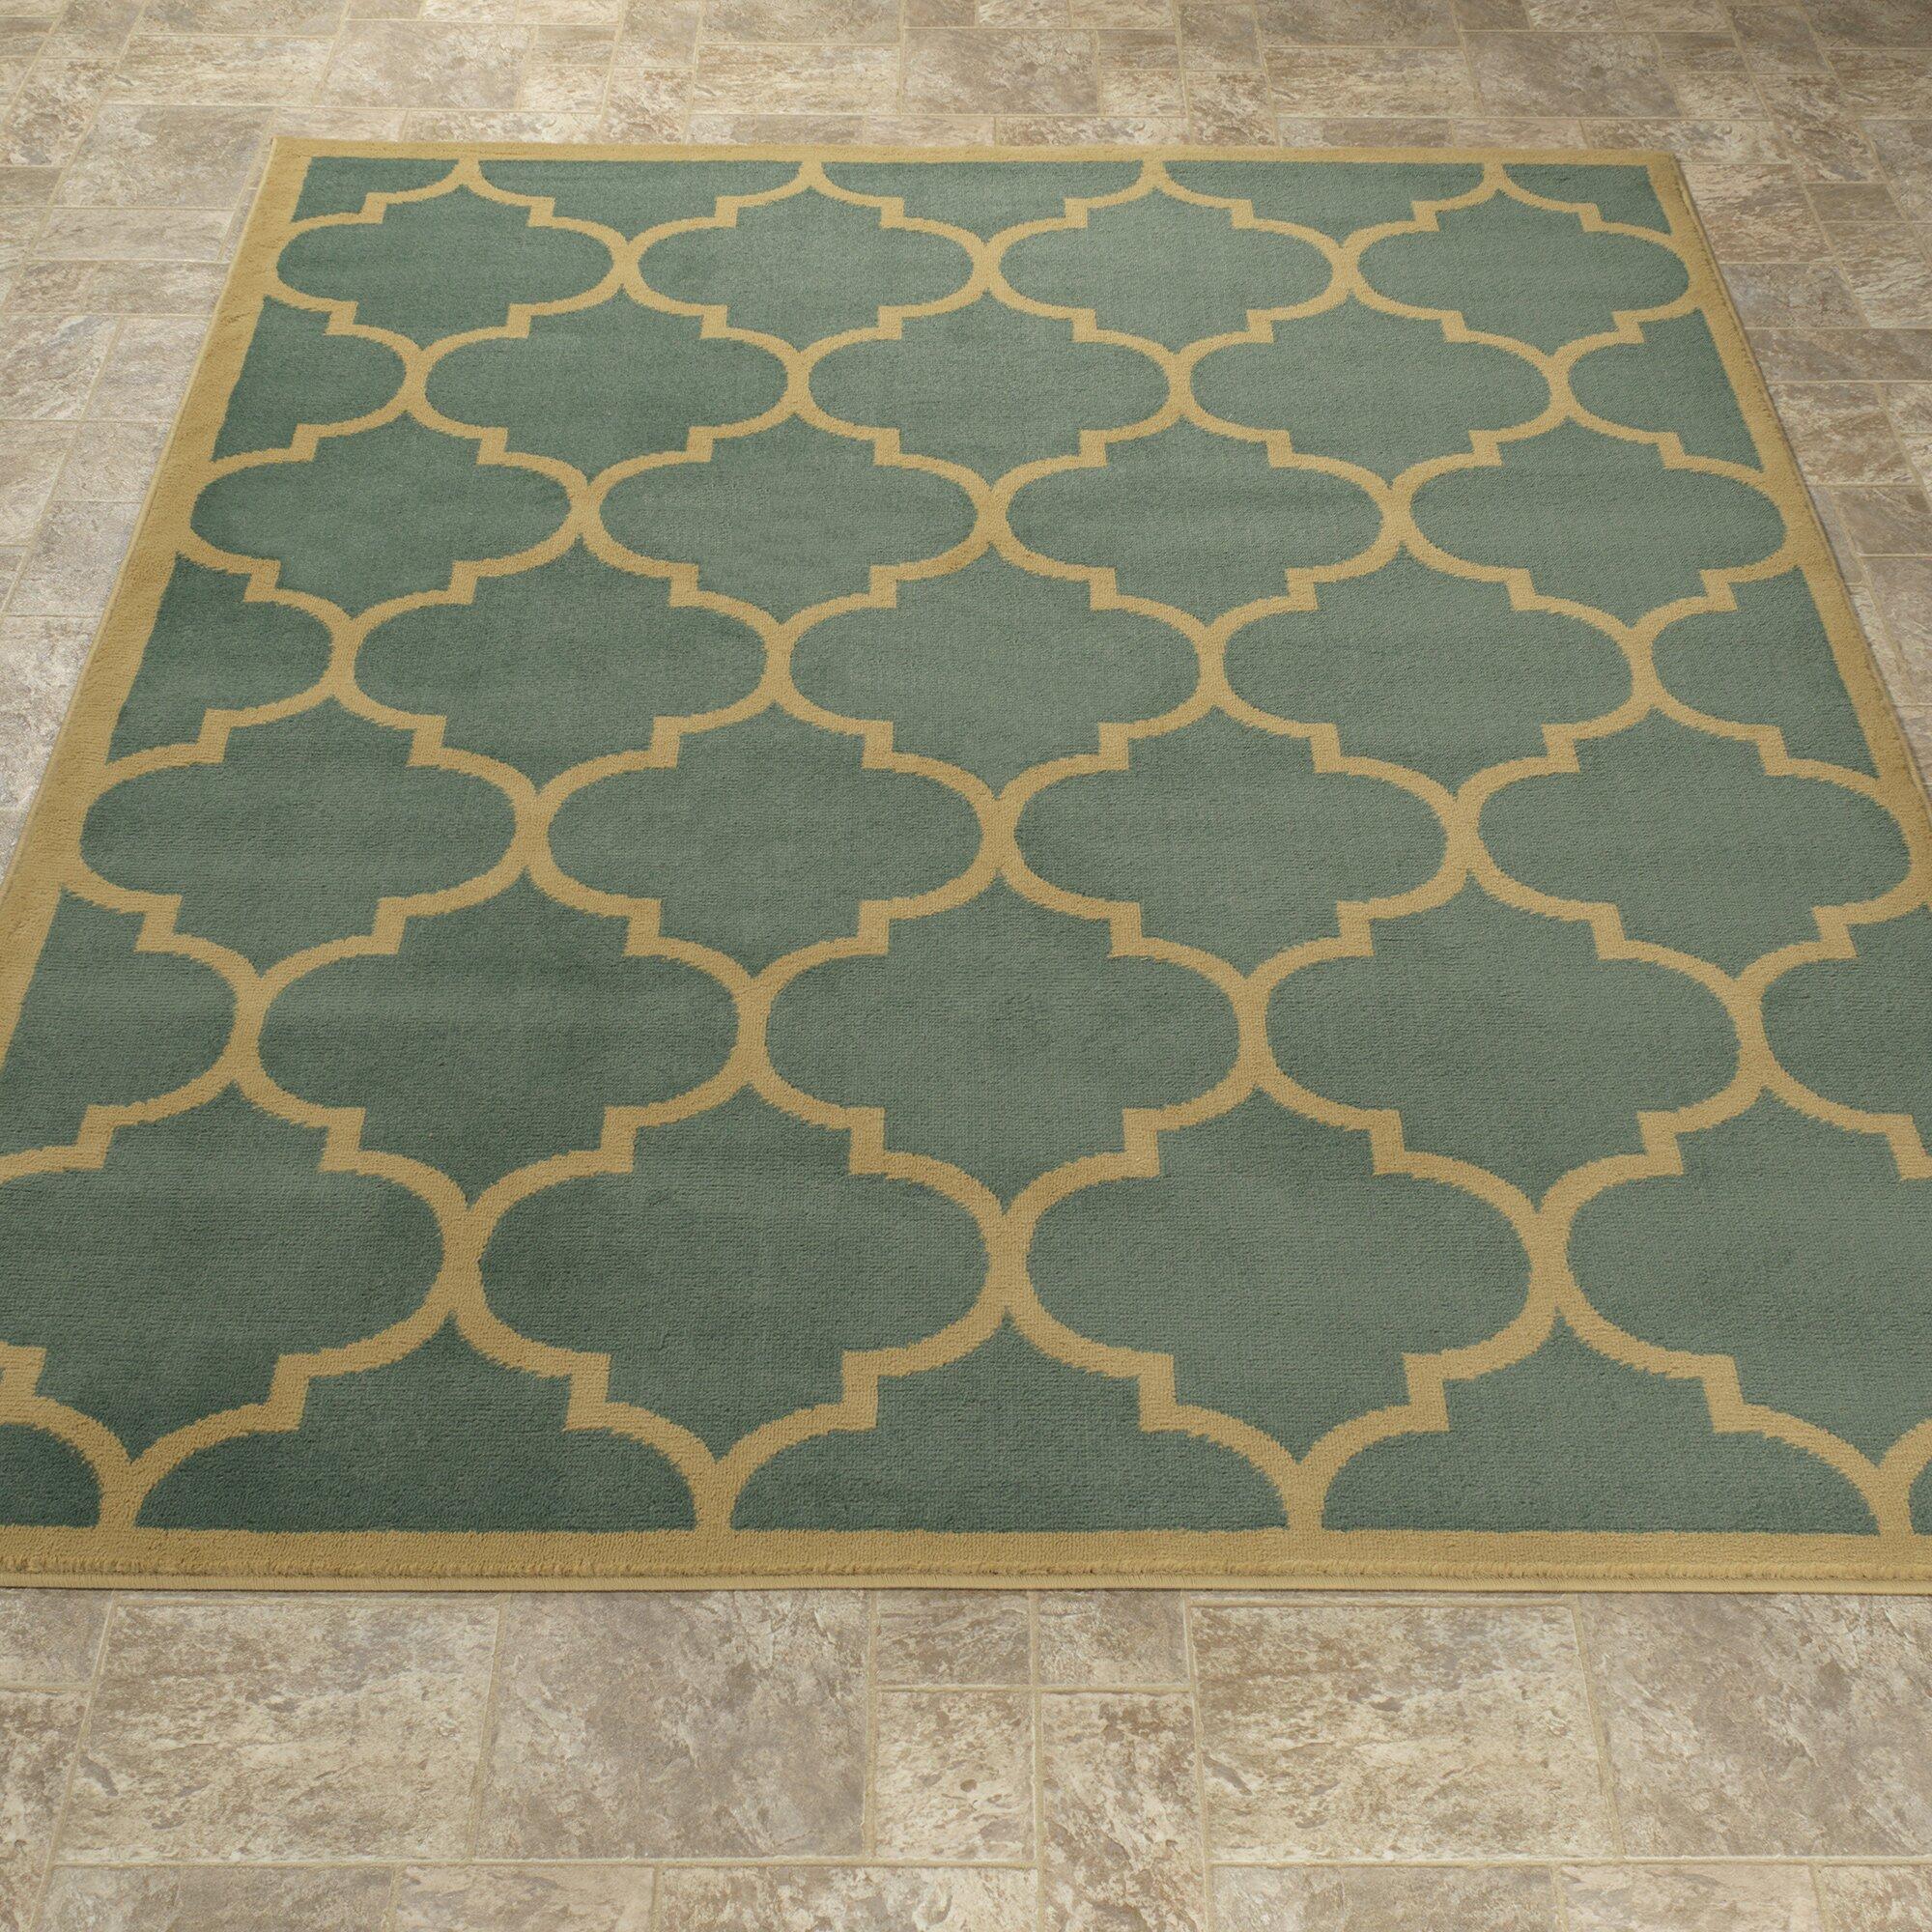 ottomanson paterson sage green area rug reviews. Black Bedroom Furniture Sets. Home Design Ideas